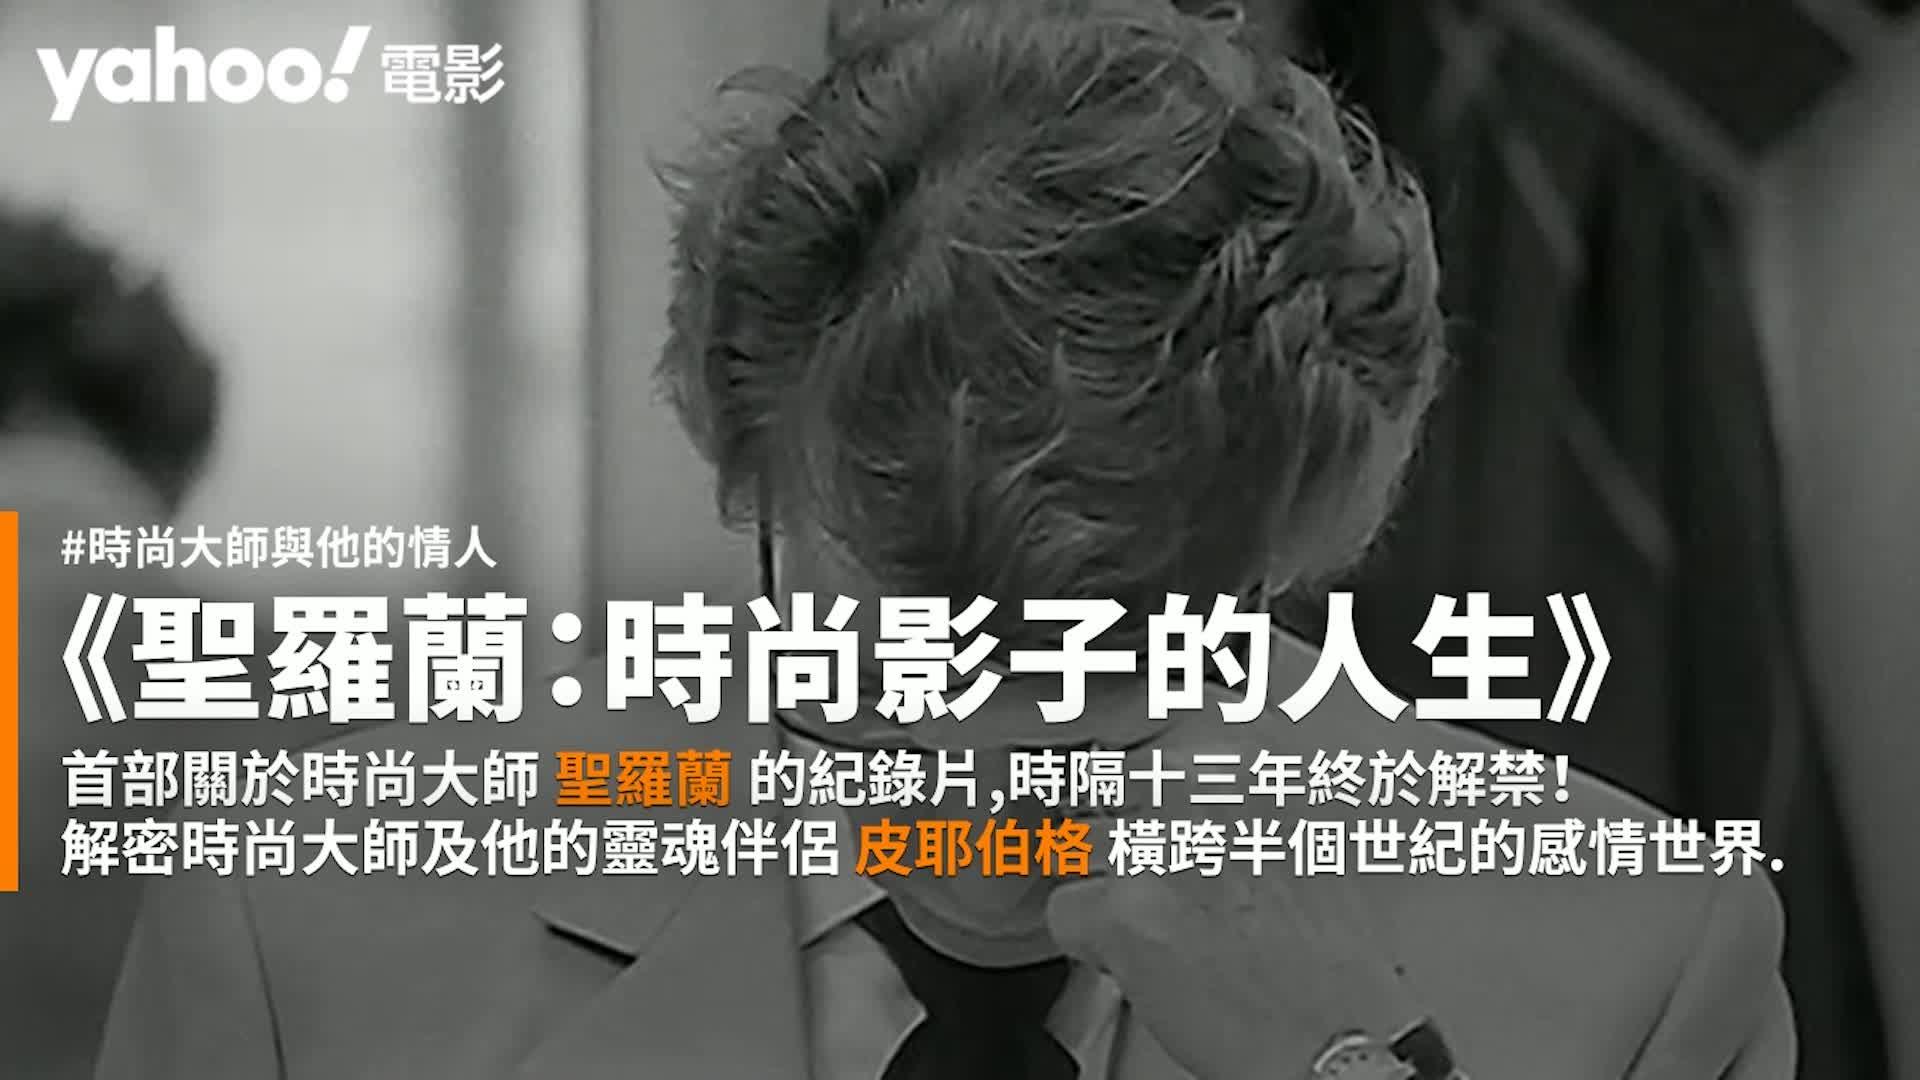 Yahoo12/10新片快報!用信用詐欺師來告別竹內結子、三浦春馬和2020!